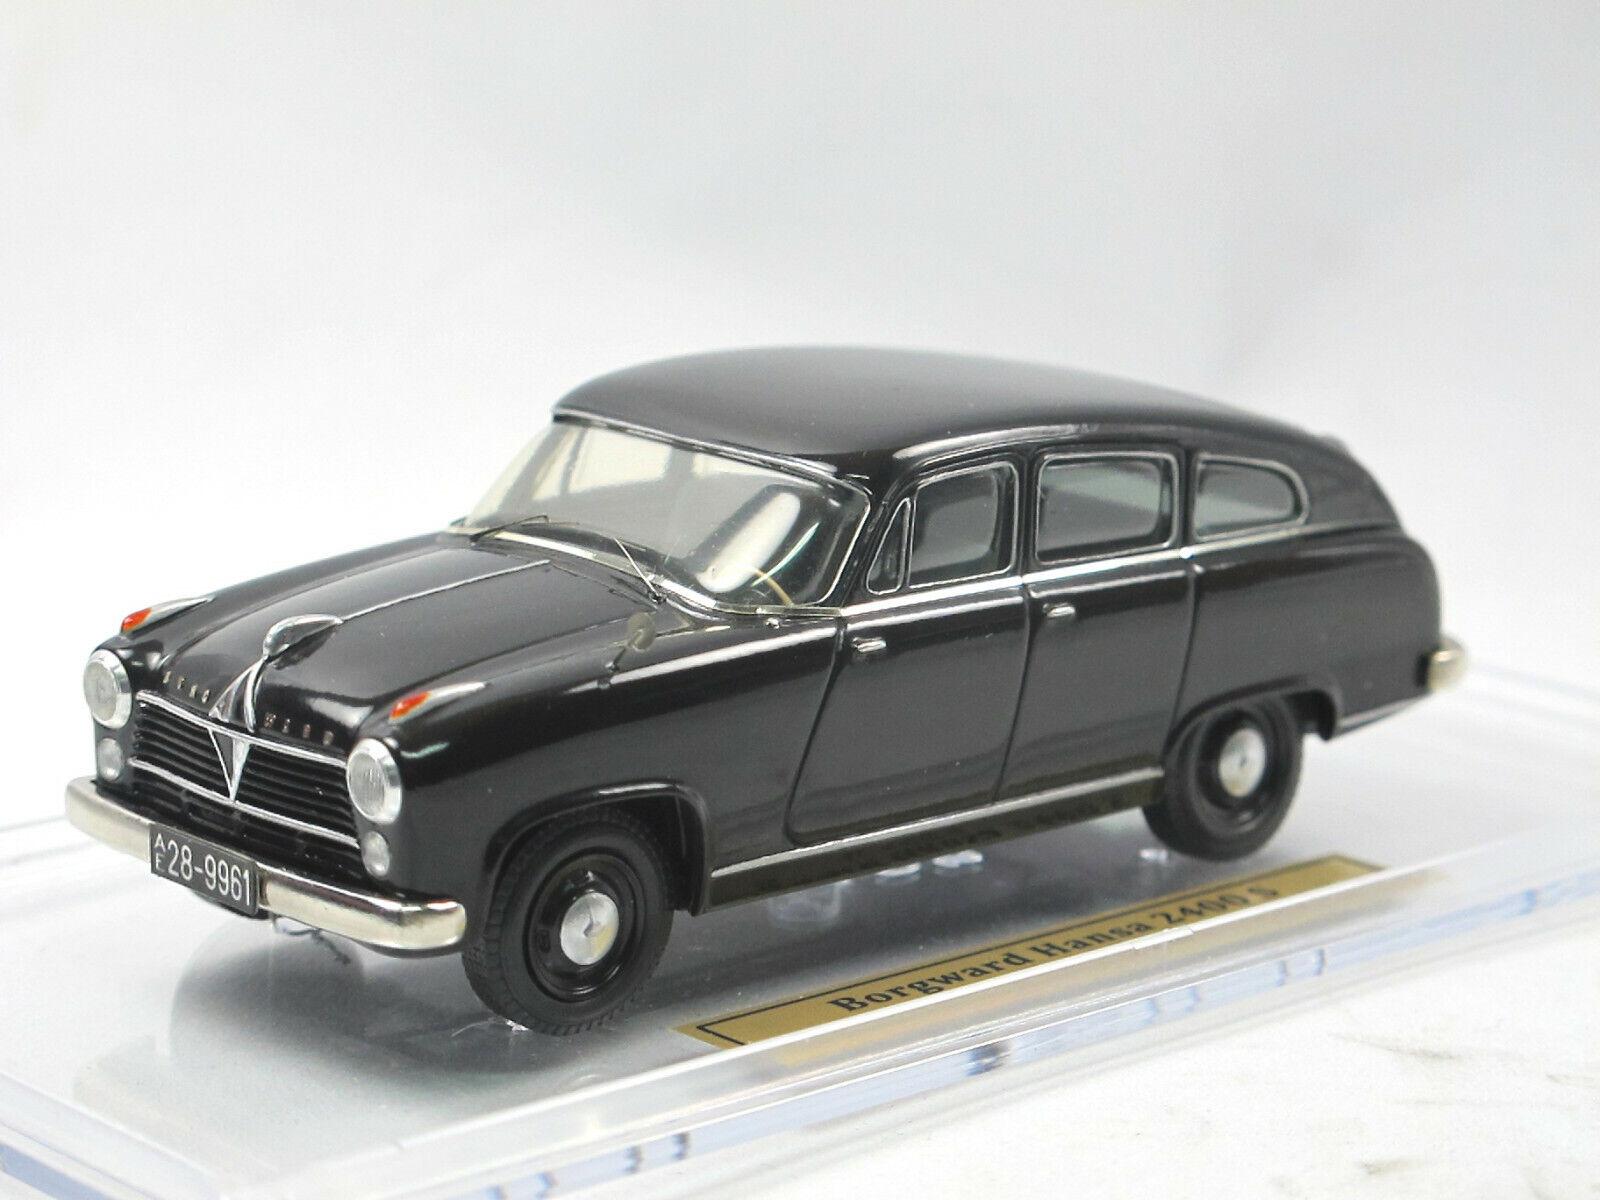 mejor precio EMC EMC EMC Models - 1952 Borgward hansa 2400 s berlina sedán-negro - 1 43  compra limitada